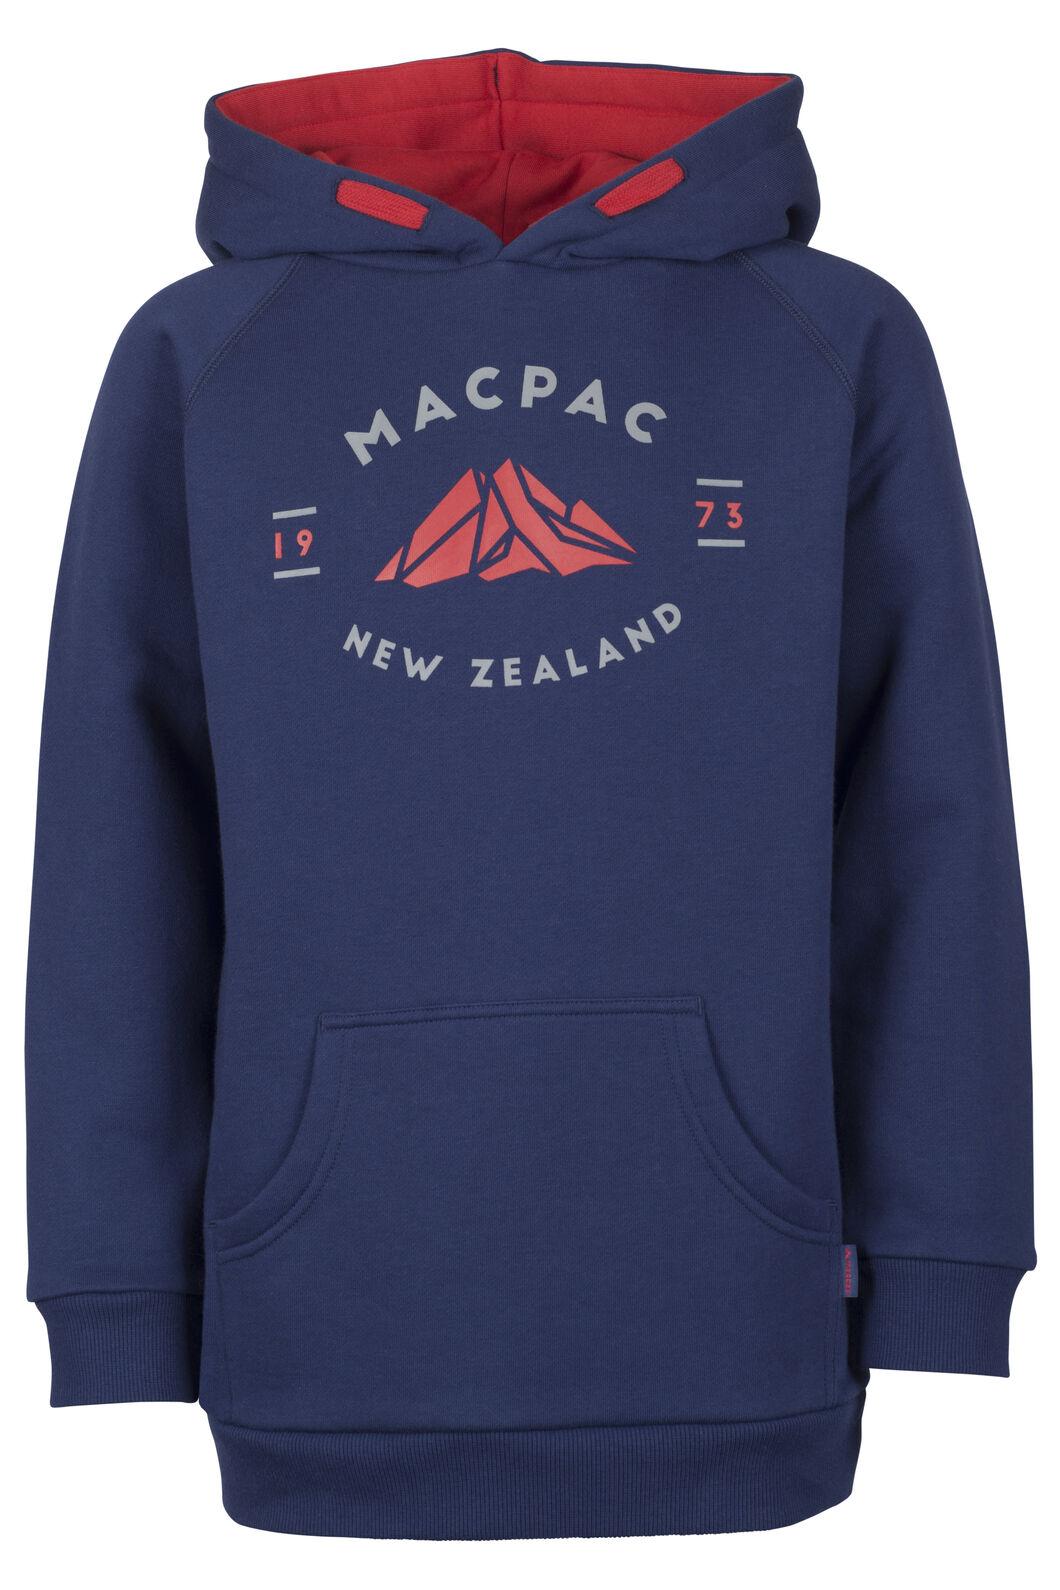 Macpac Organic Mountain Hoody - Kids', Medieval Blue, hi-res